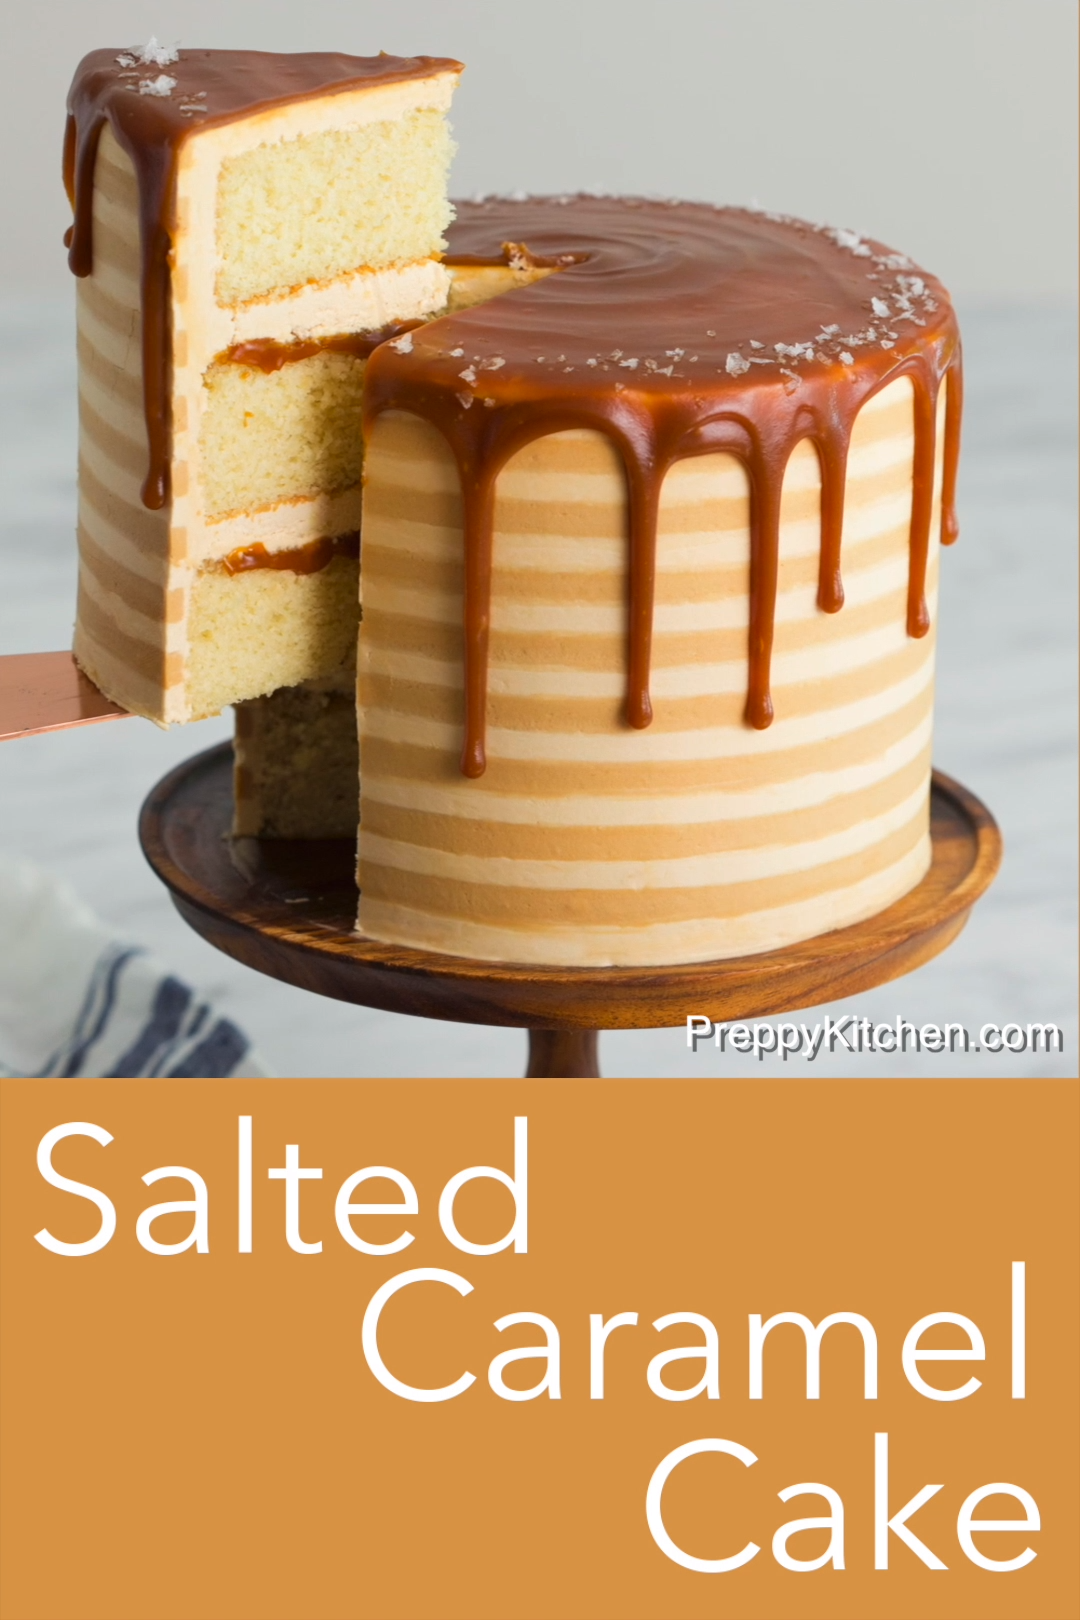 Salted Caramel Cake #cakedecoratingvideos